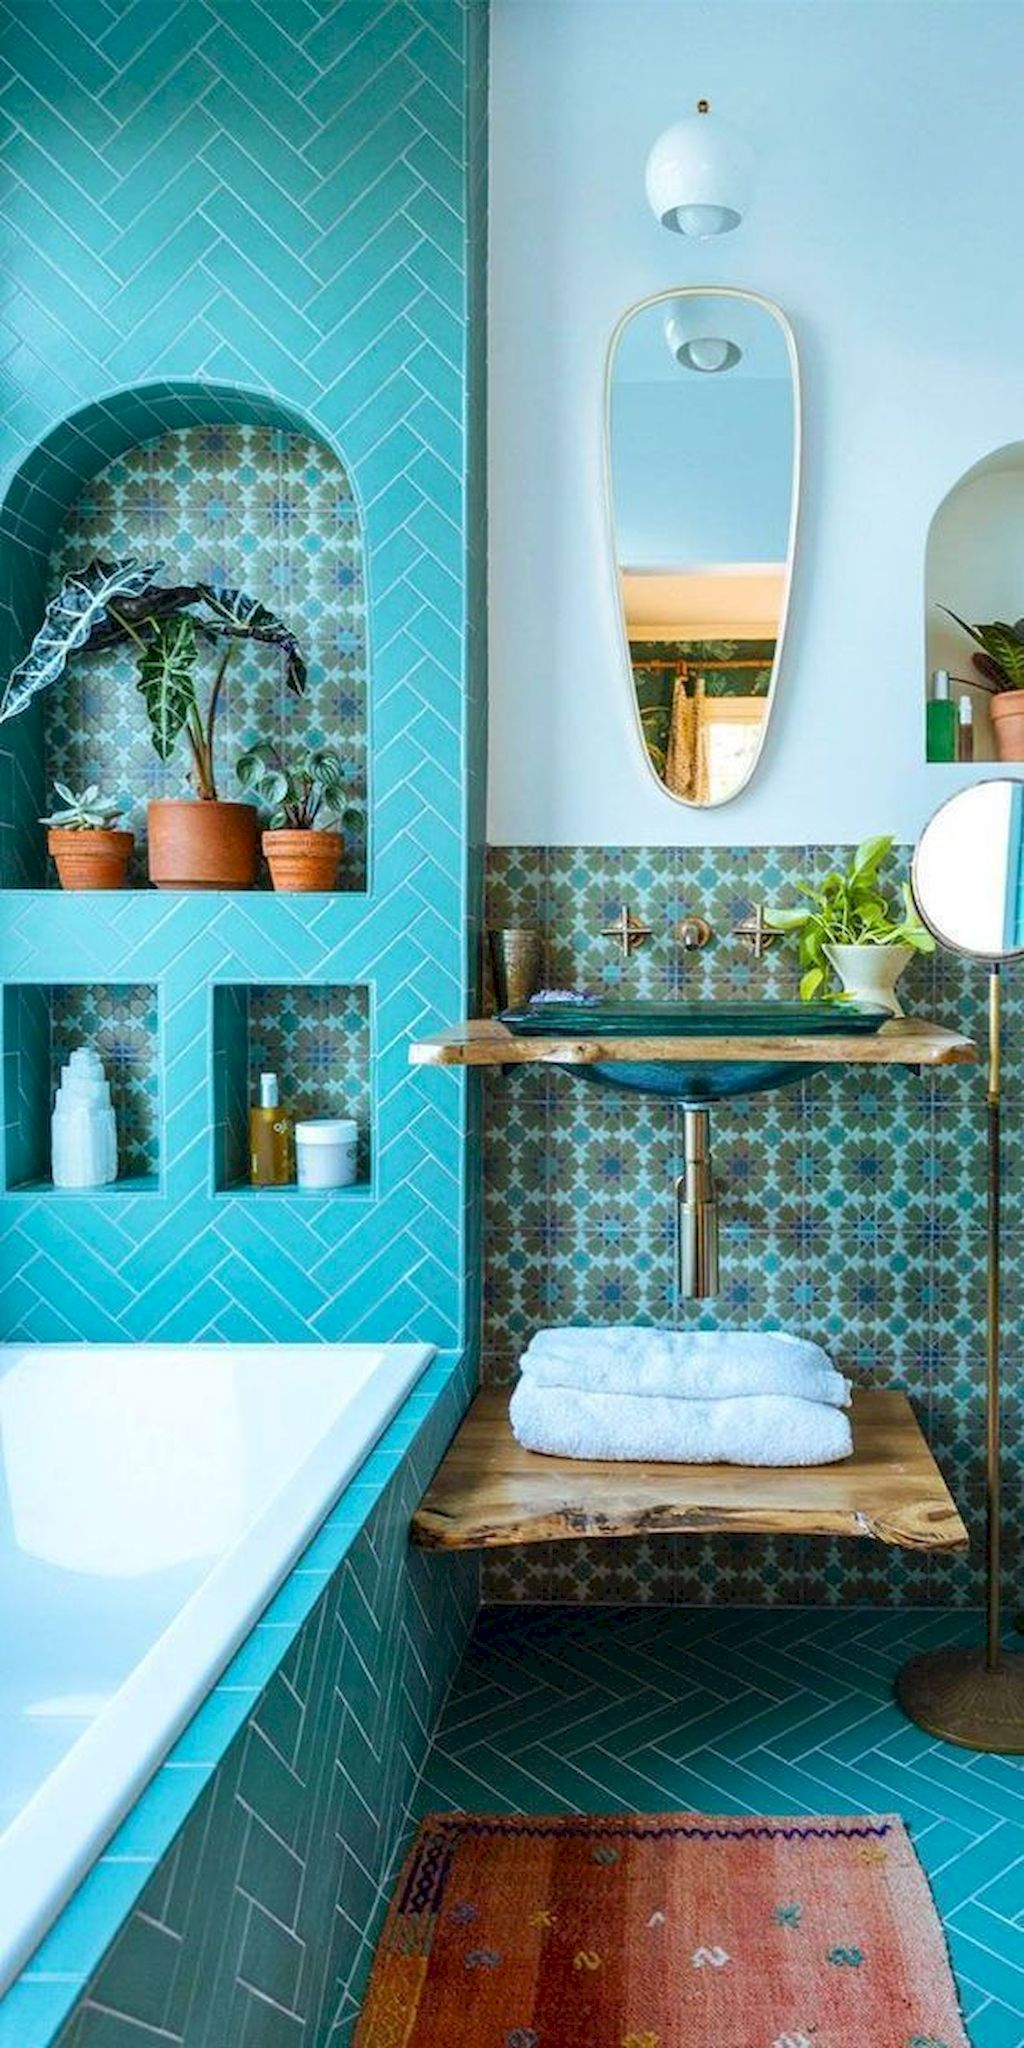 Superb Stylish Color Scheme For Your Bathroom